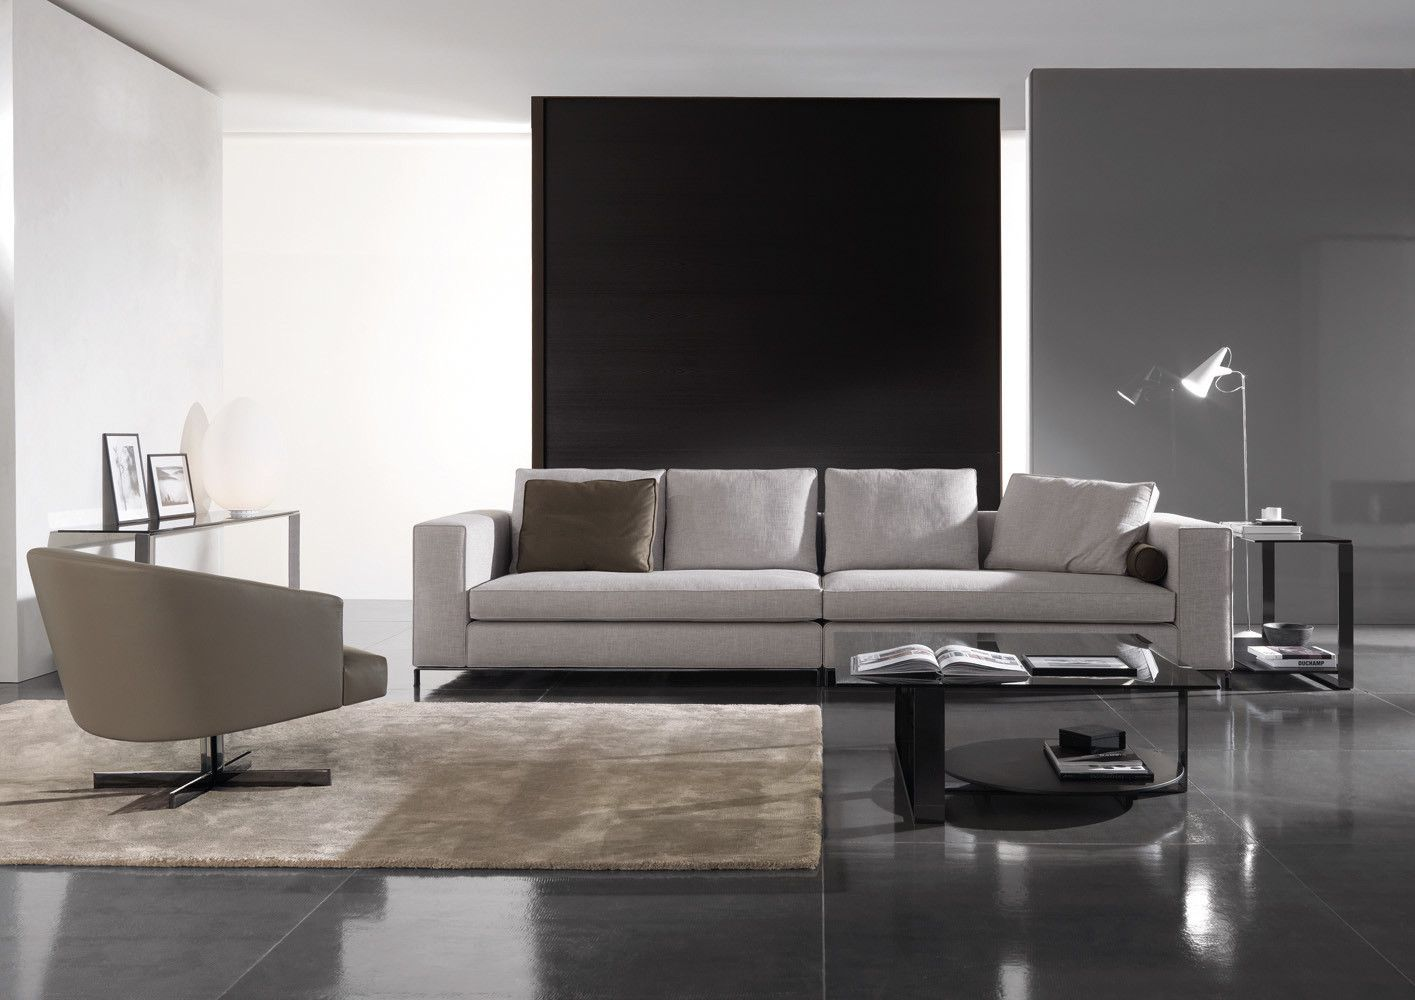 Sofá CSF1028 | Minotti, Interior design, Sofa design